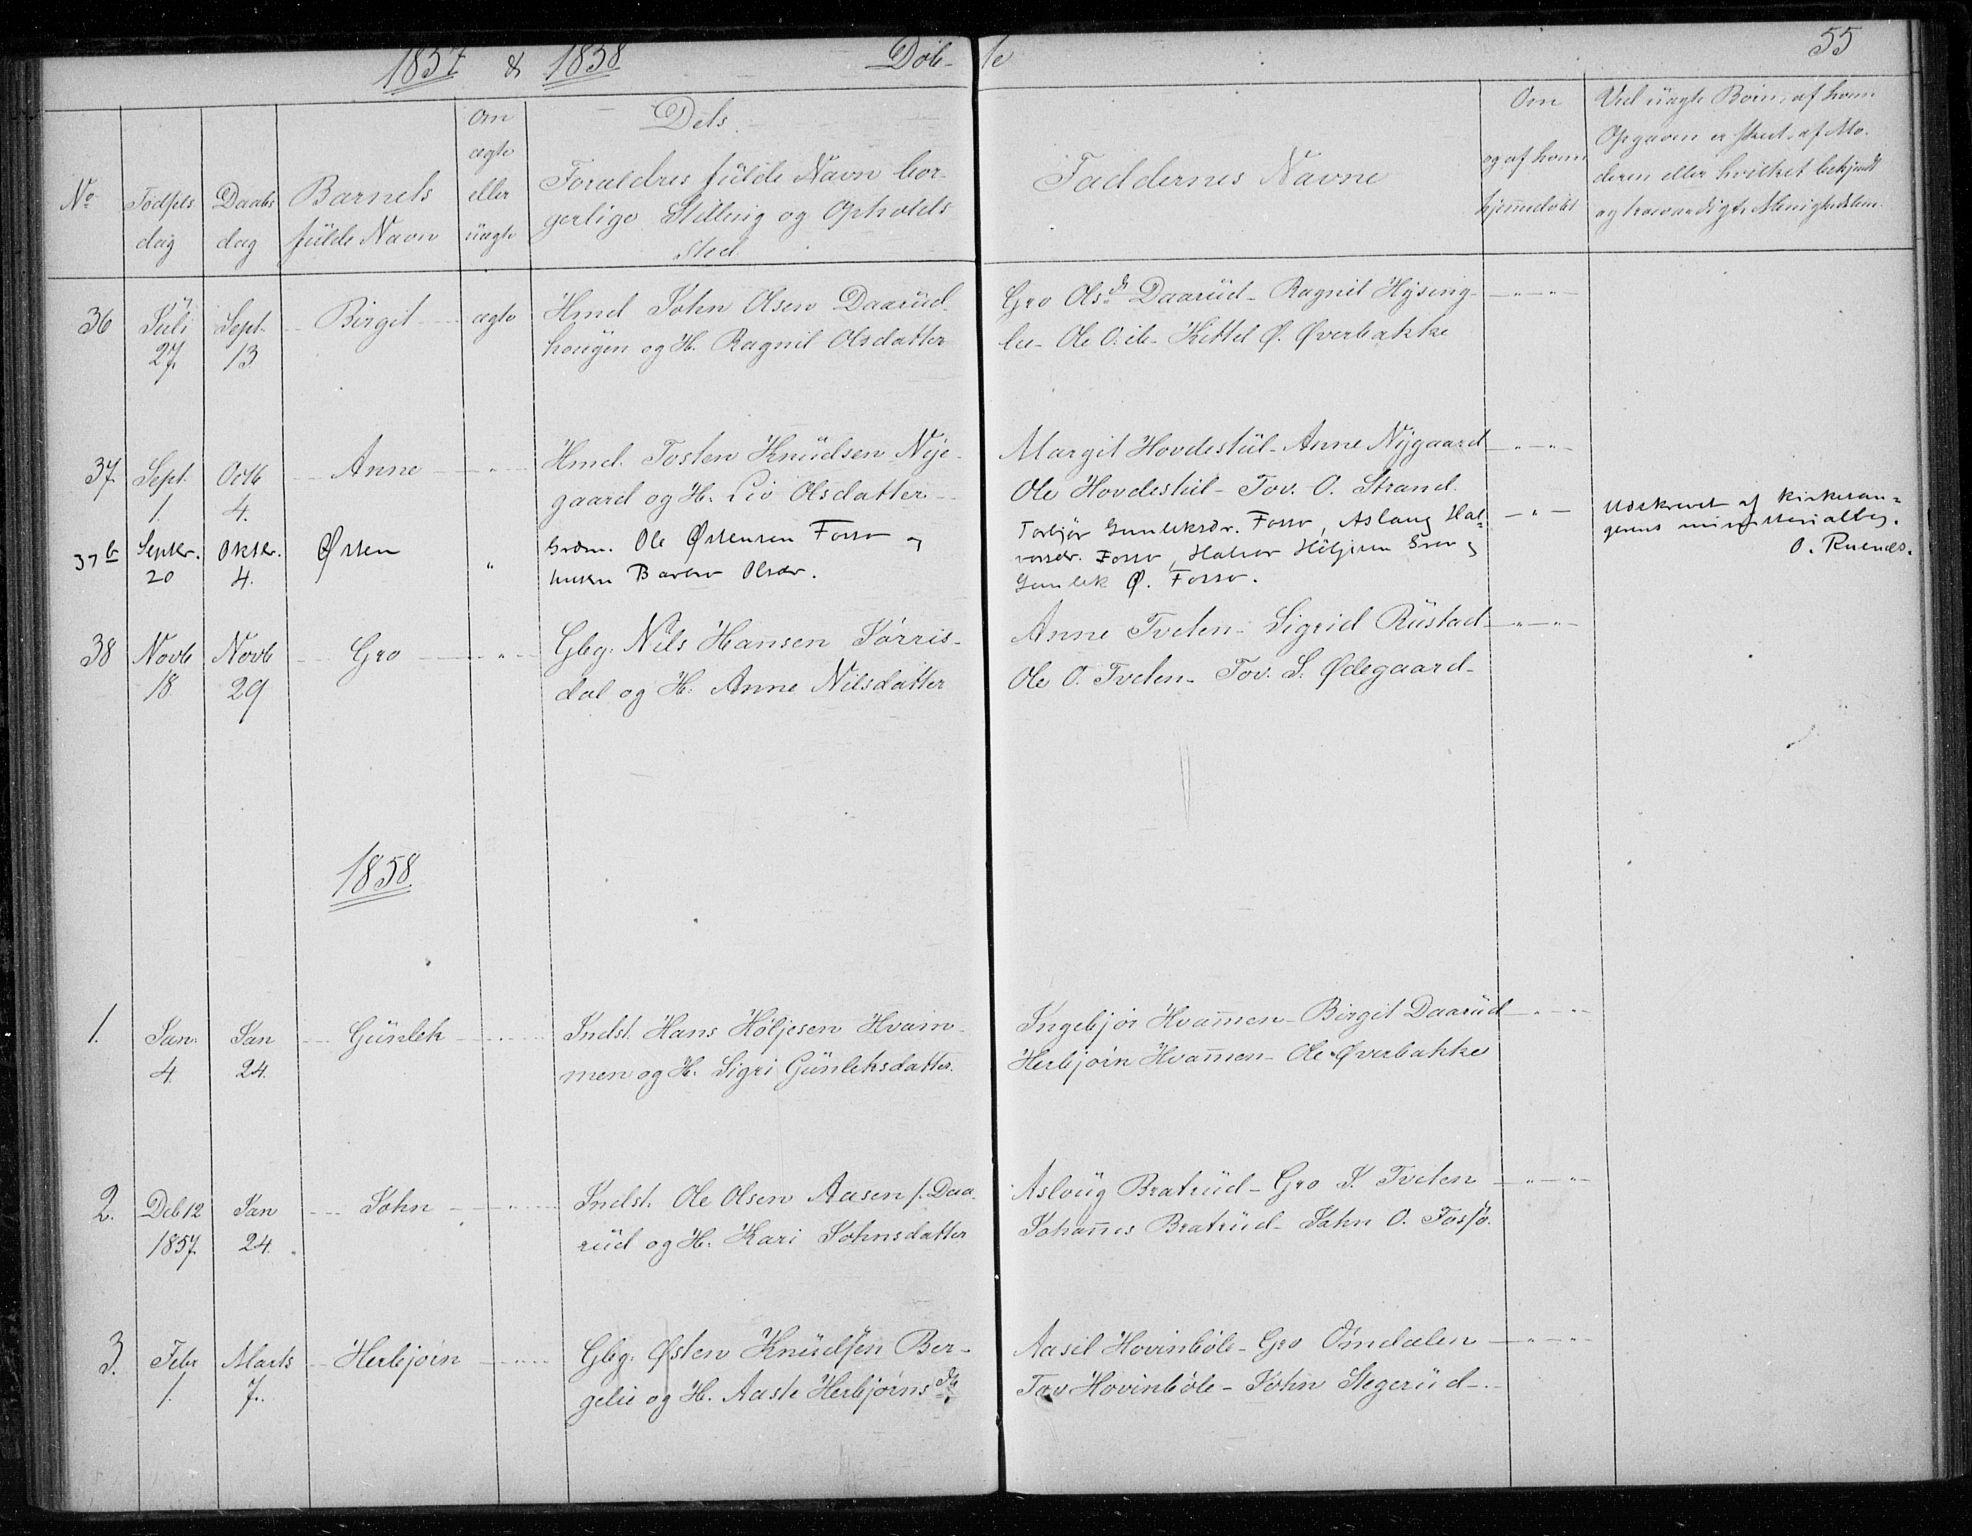 SAKO, Gransherad kirkebøker, F/Fb/L0003: Ministerialbok nr. II 3, 1844-1859, s. 55